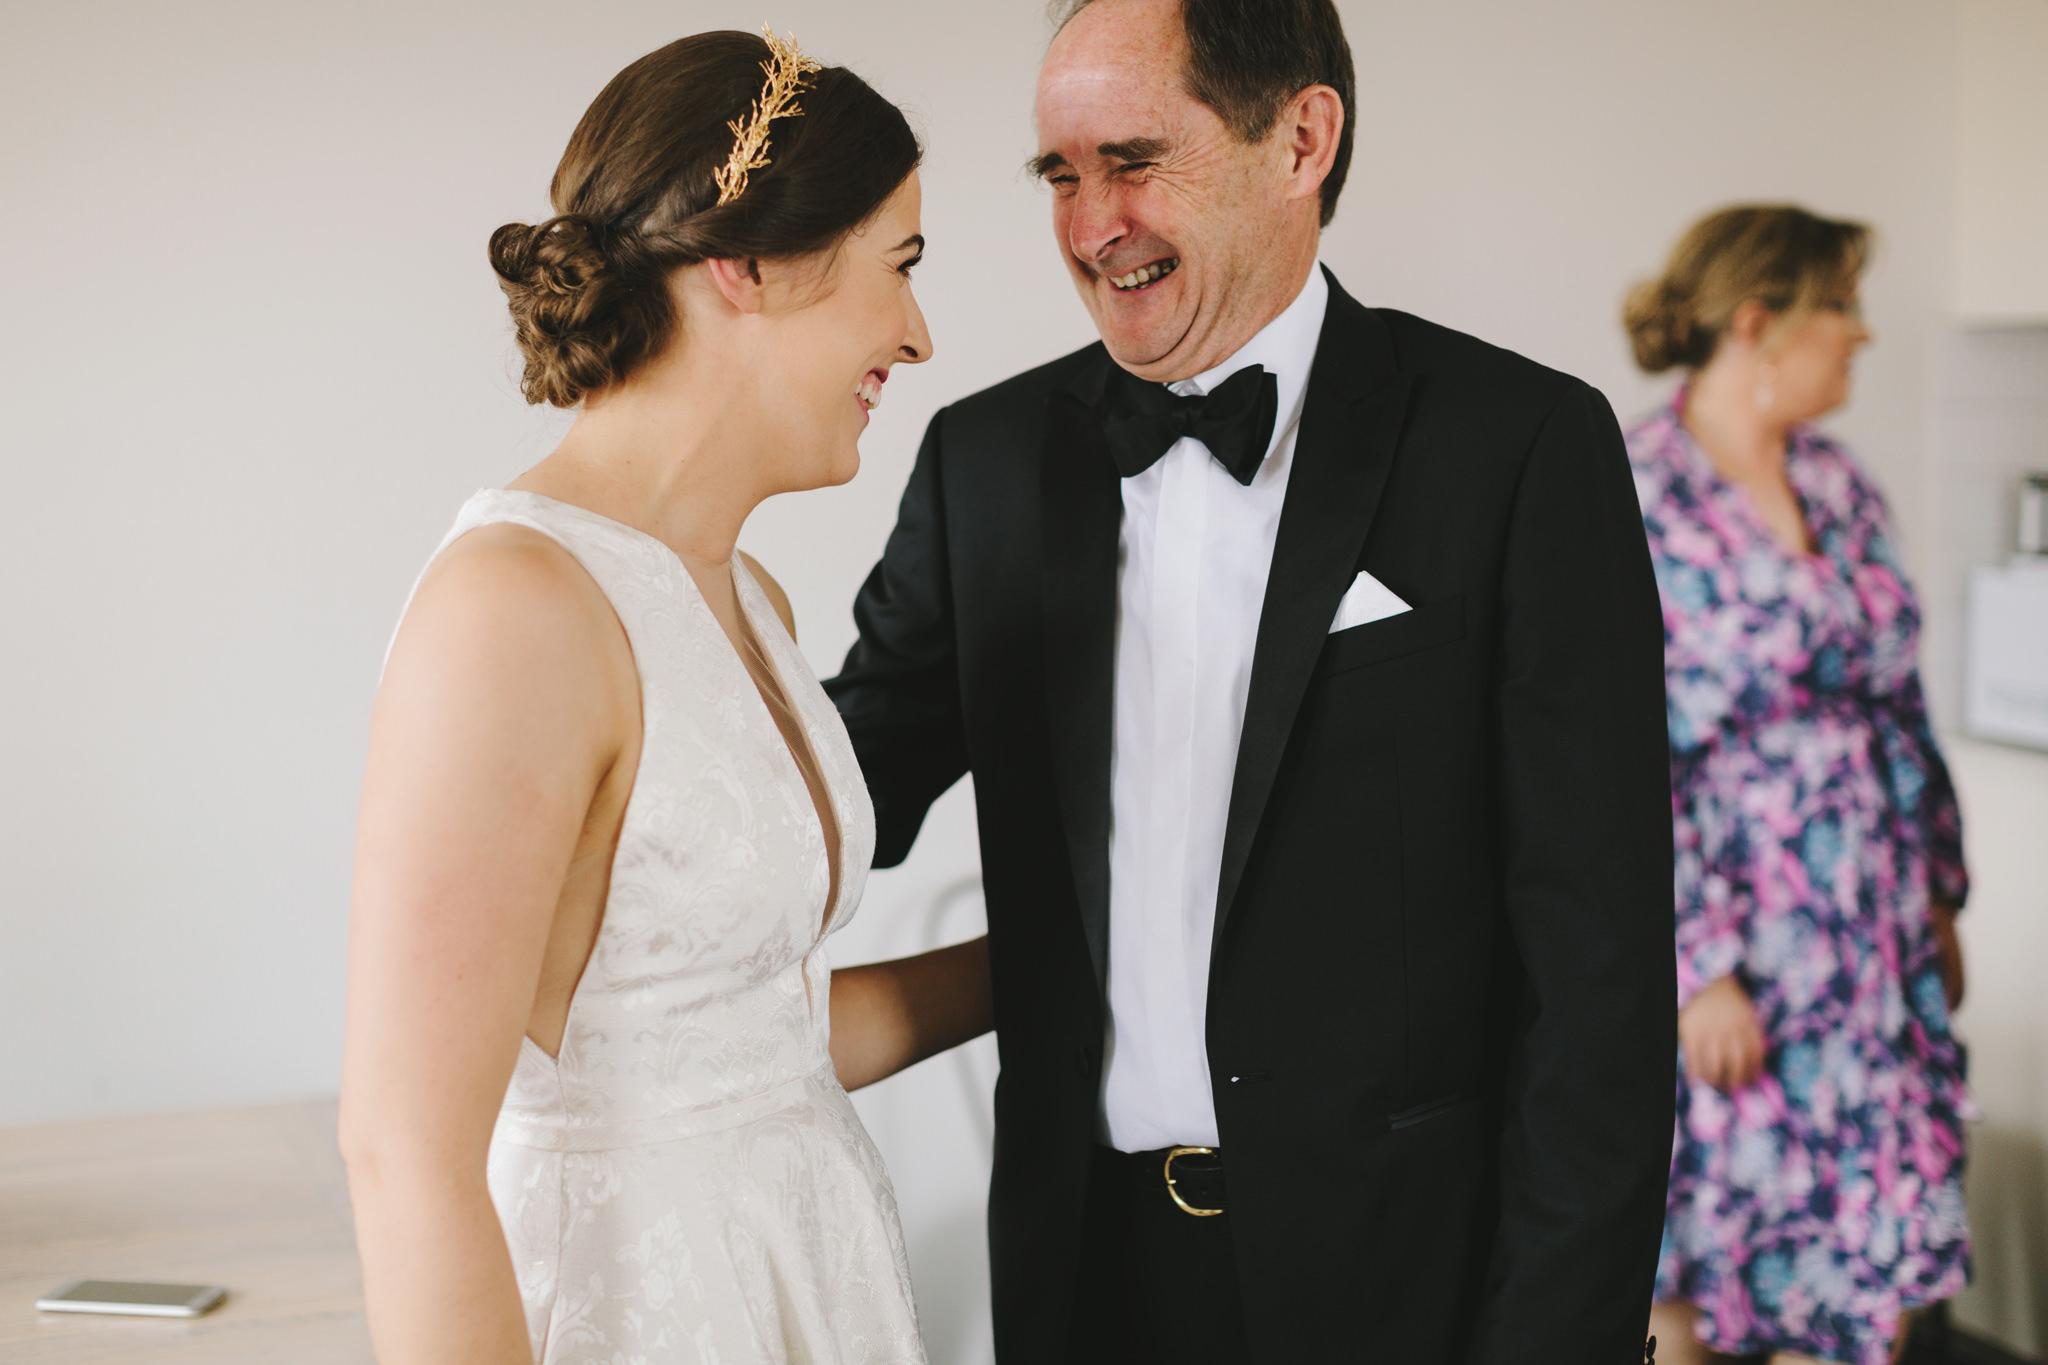 Abbotsford_Convent_Wedding_Peter_Anna031.JPG